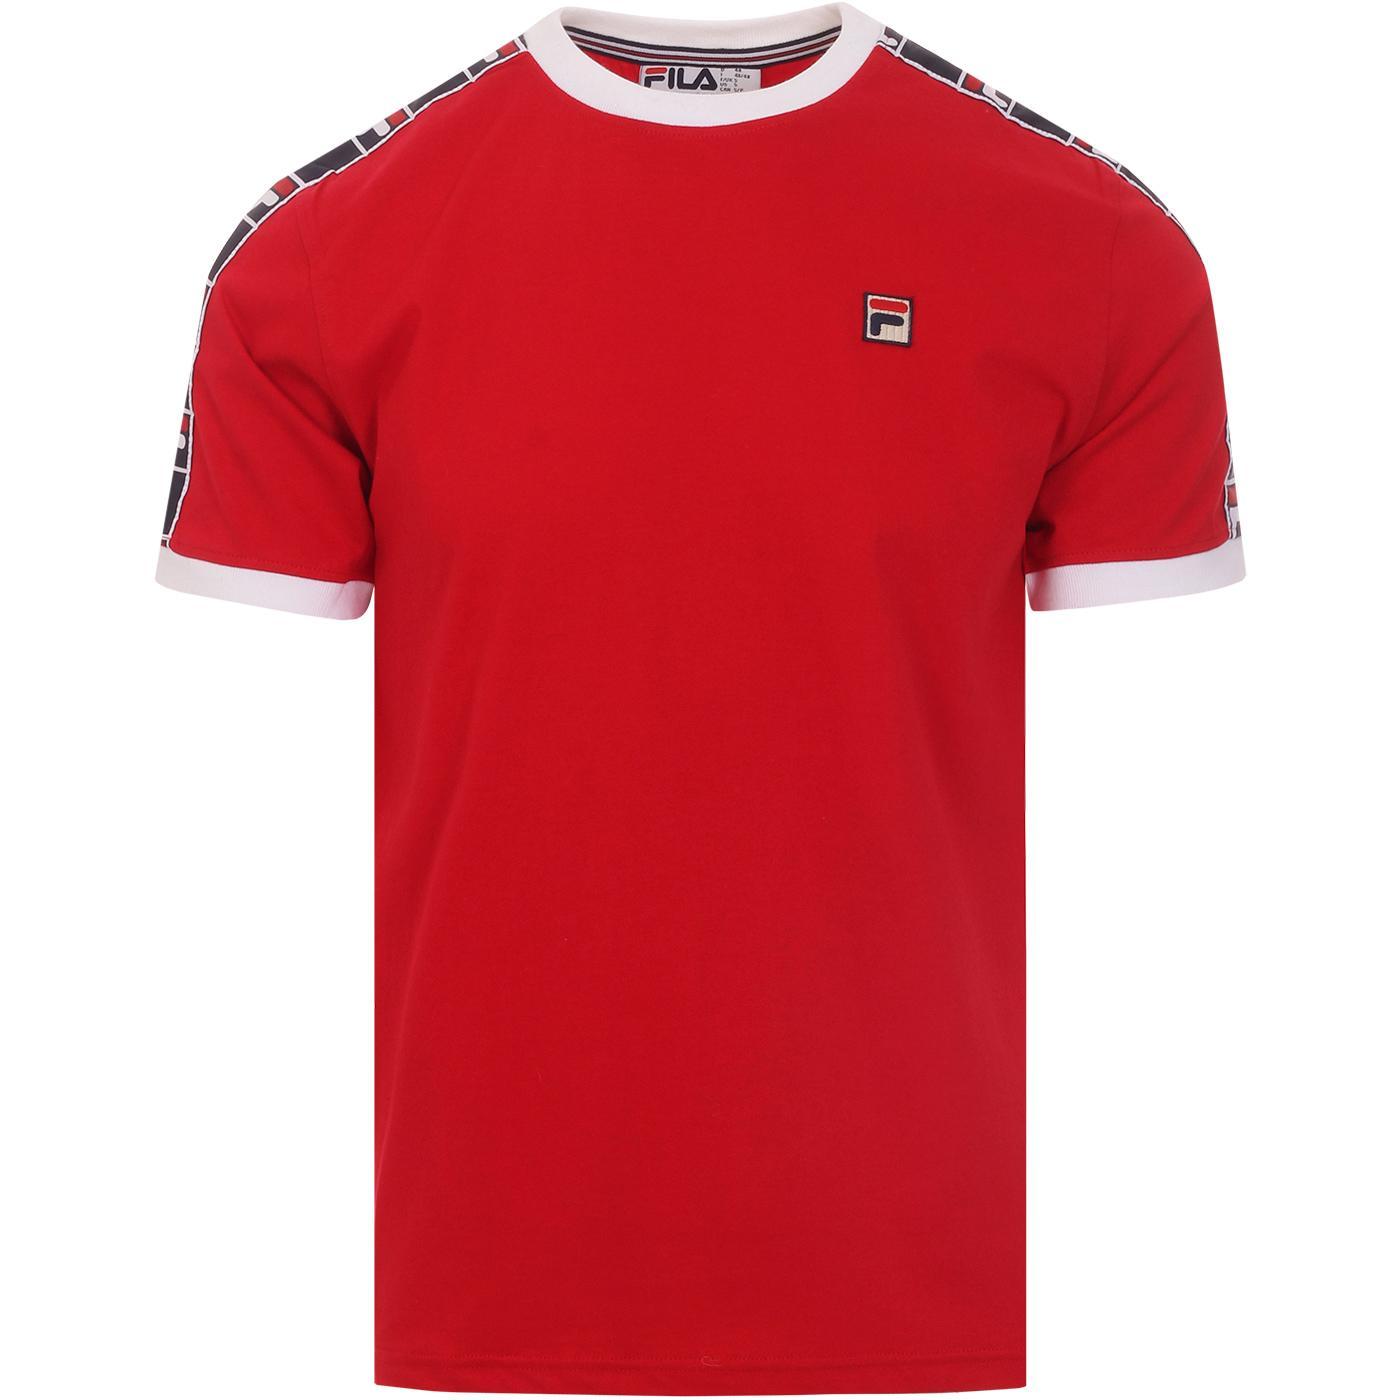 Luca FILA VINTAGE Taped Sleeve Ringer T-shirt RED